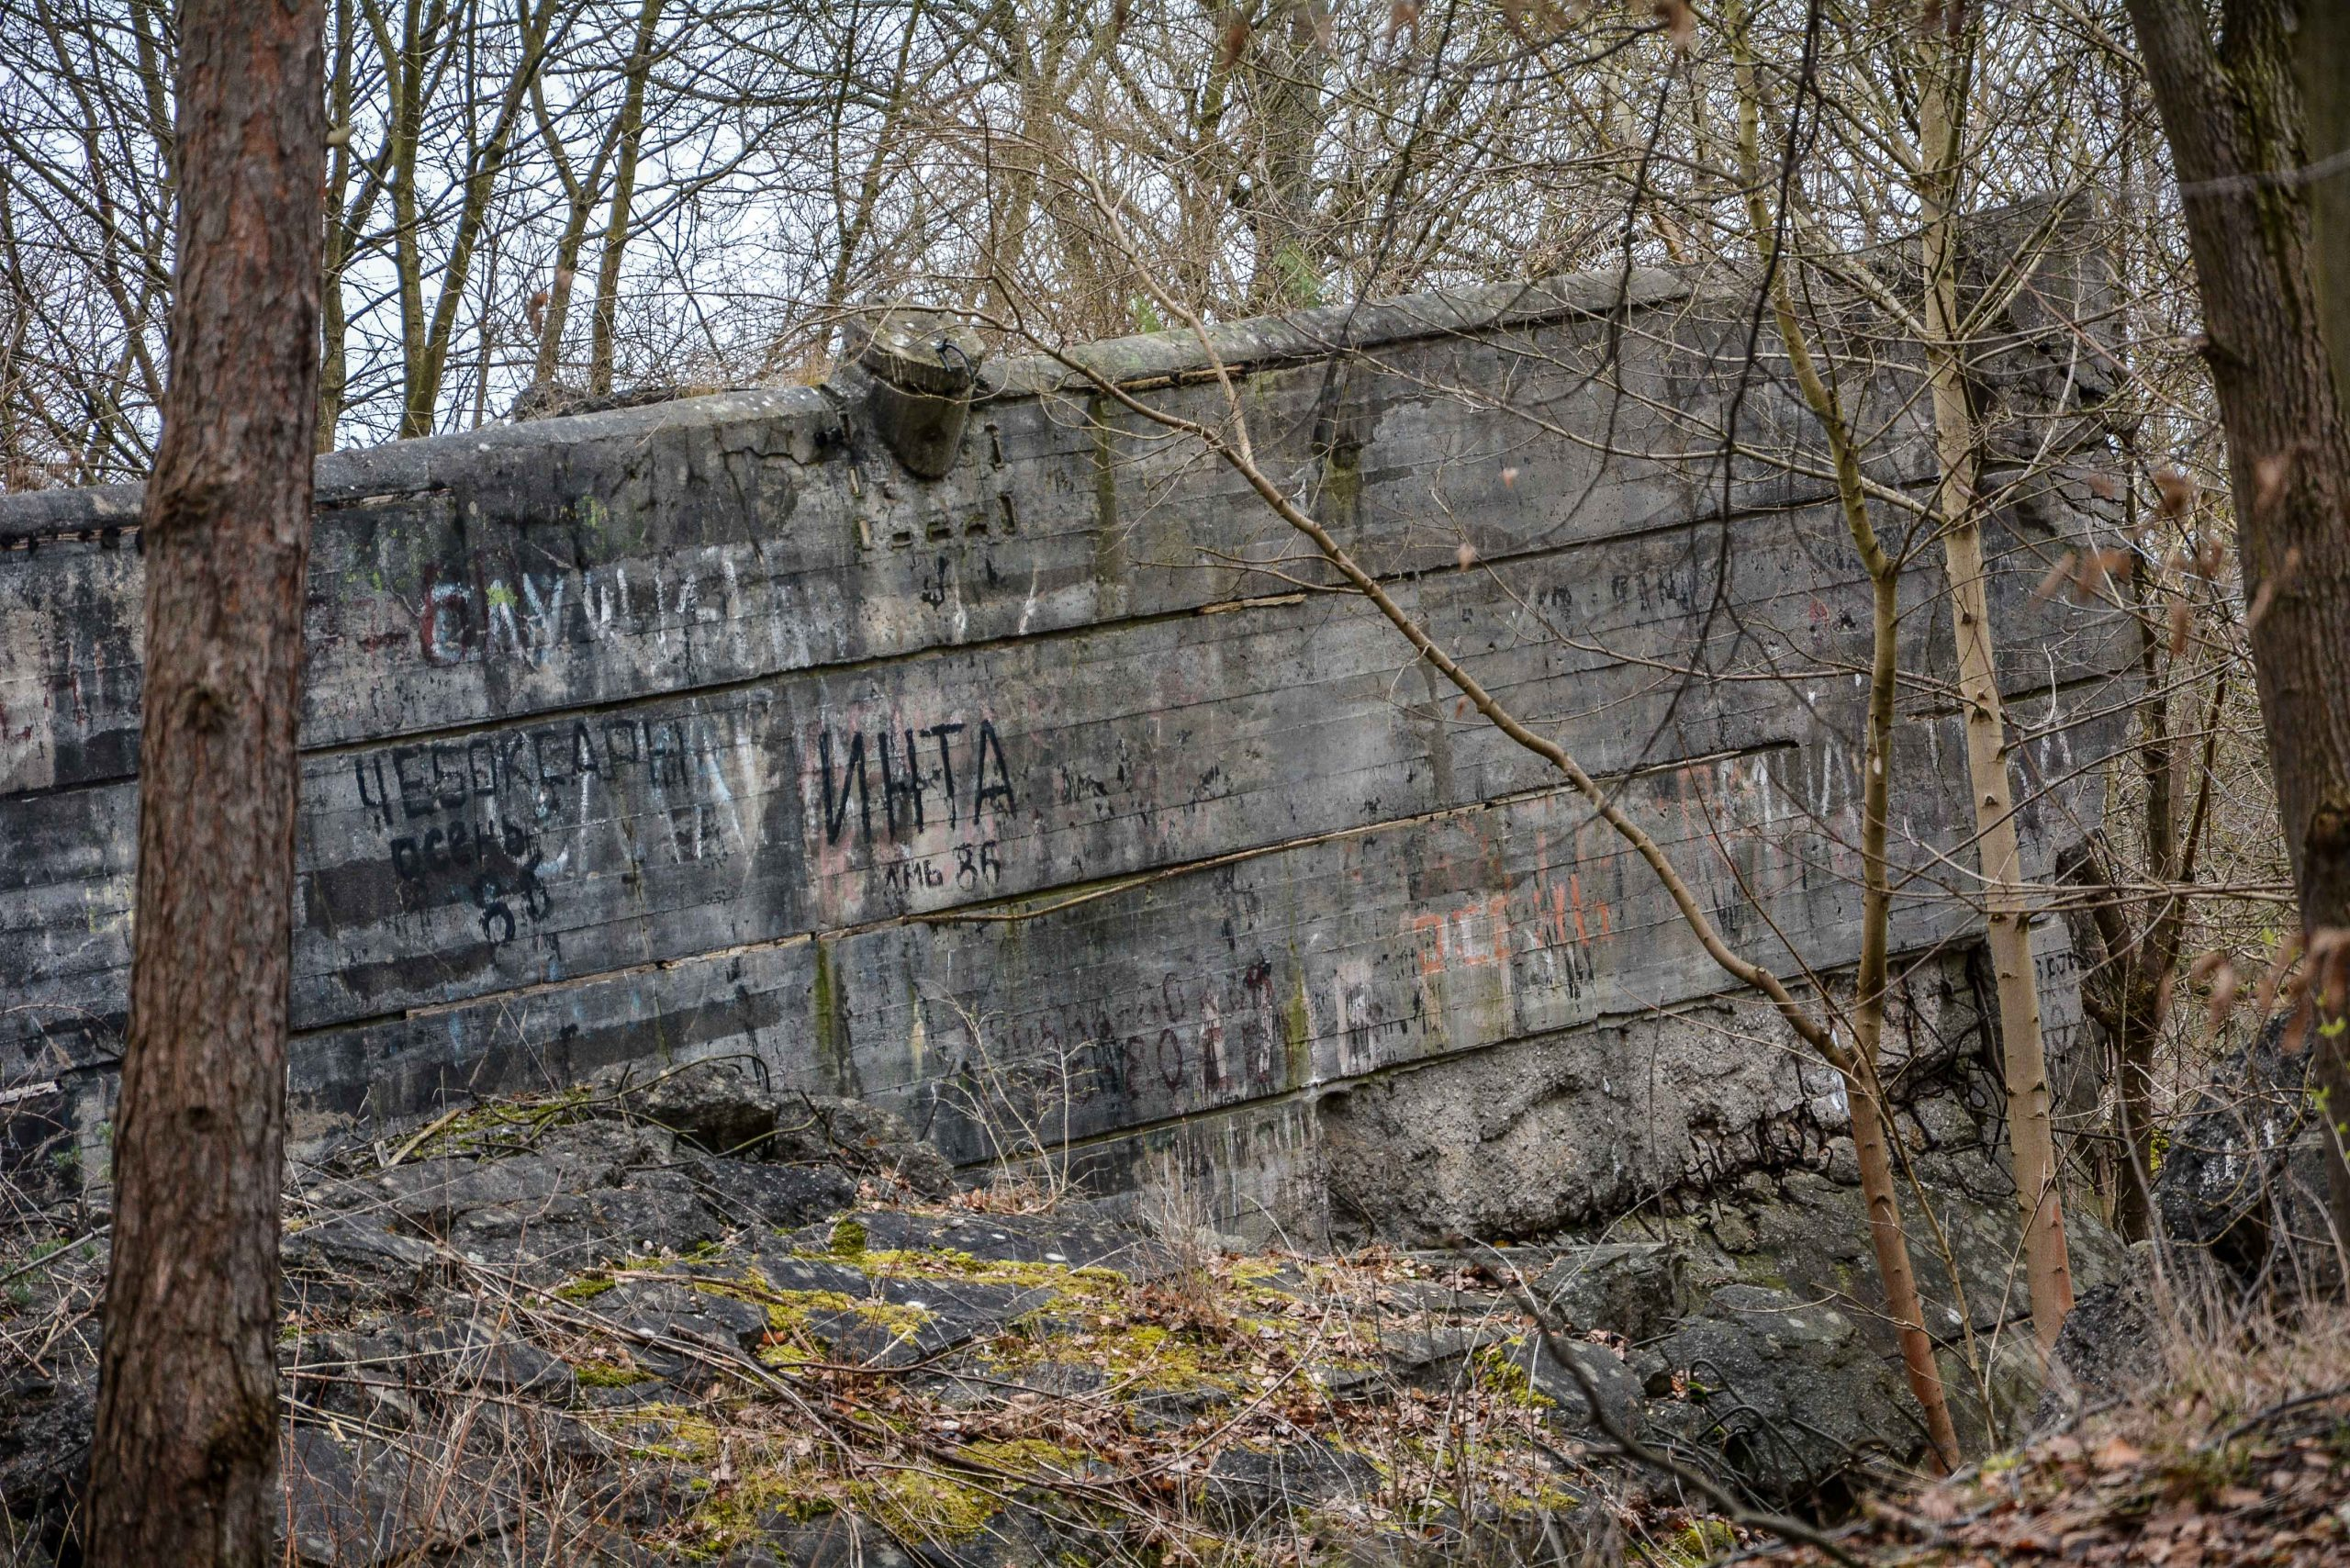 wehrmacht bunker soviet graffiti bunker zeppelin amt 500 maybach bunker ranet wehrmacht sowjet soviet military zossen brandenburg germany lost palces urbex abandoned